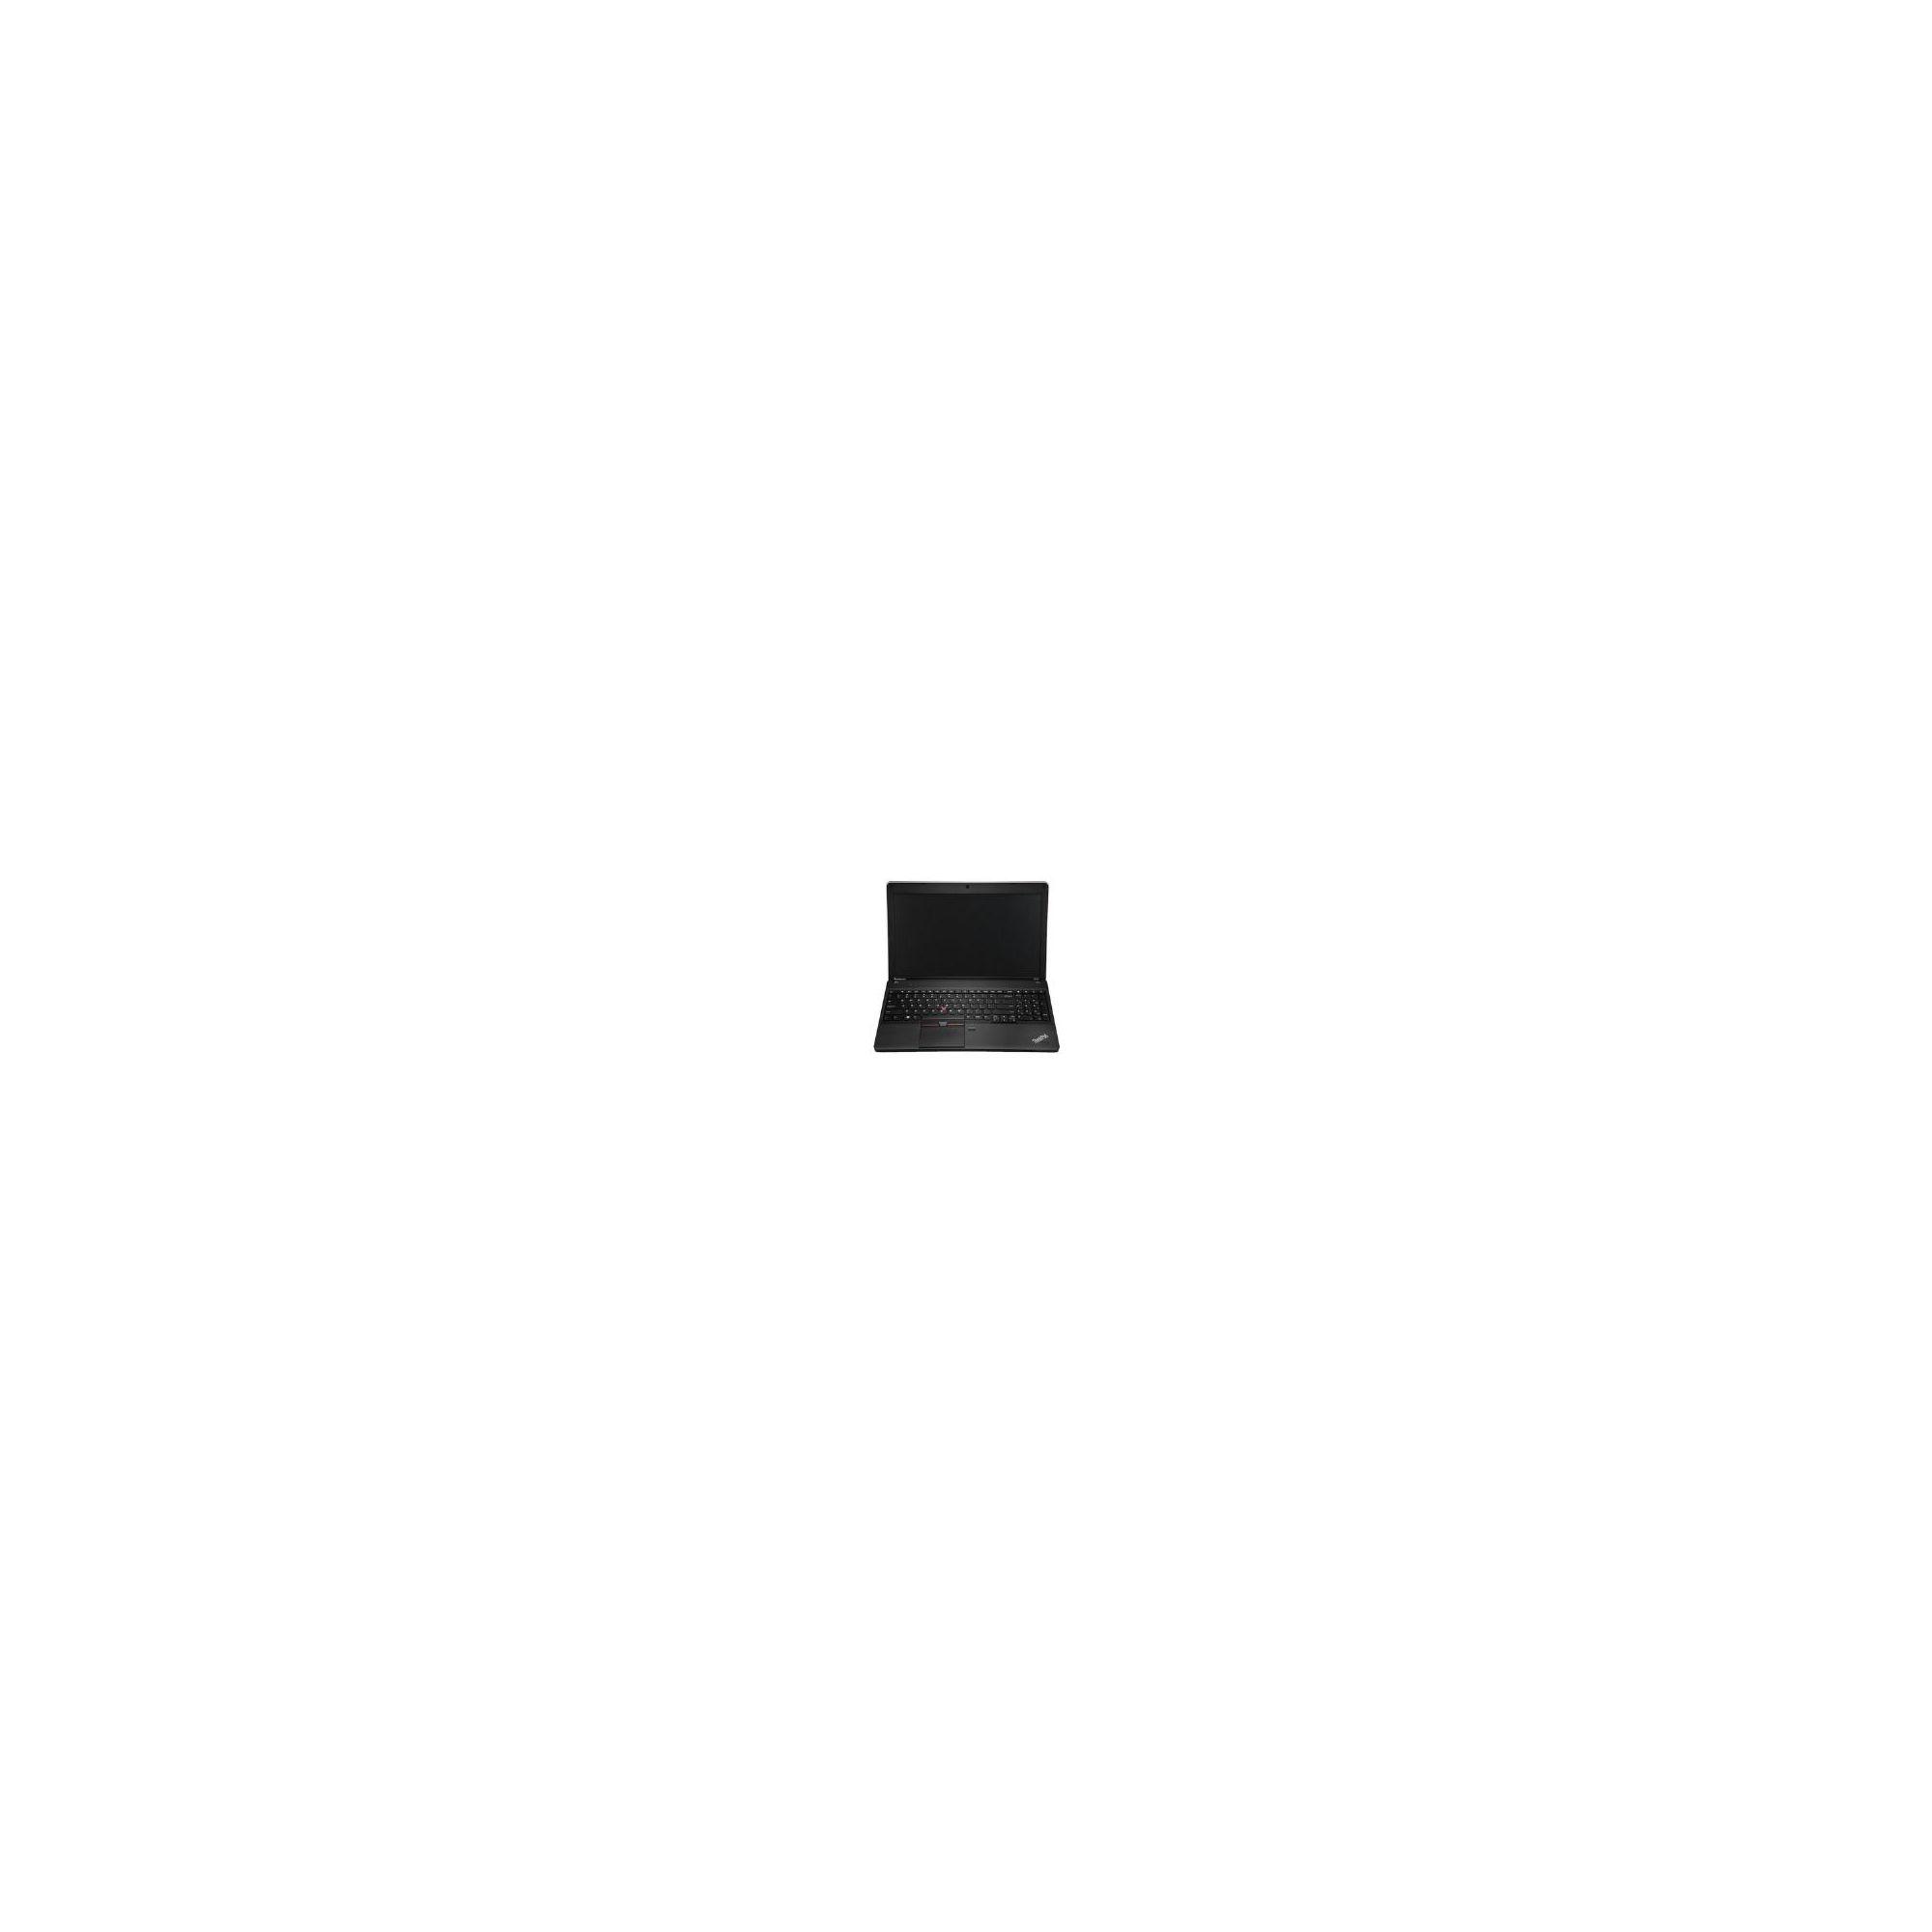 Lenovo ThinkPad Edge E530 627226G (15.6 inch) Notebook Core i3 (2328M) 2.2GHz 4GB 500GB DVD±RW WLAN BT Webcam Windows 7 Pro 64-bit/Windows 8 Pro at Tesco Direct